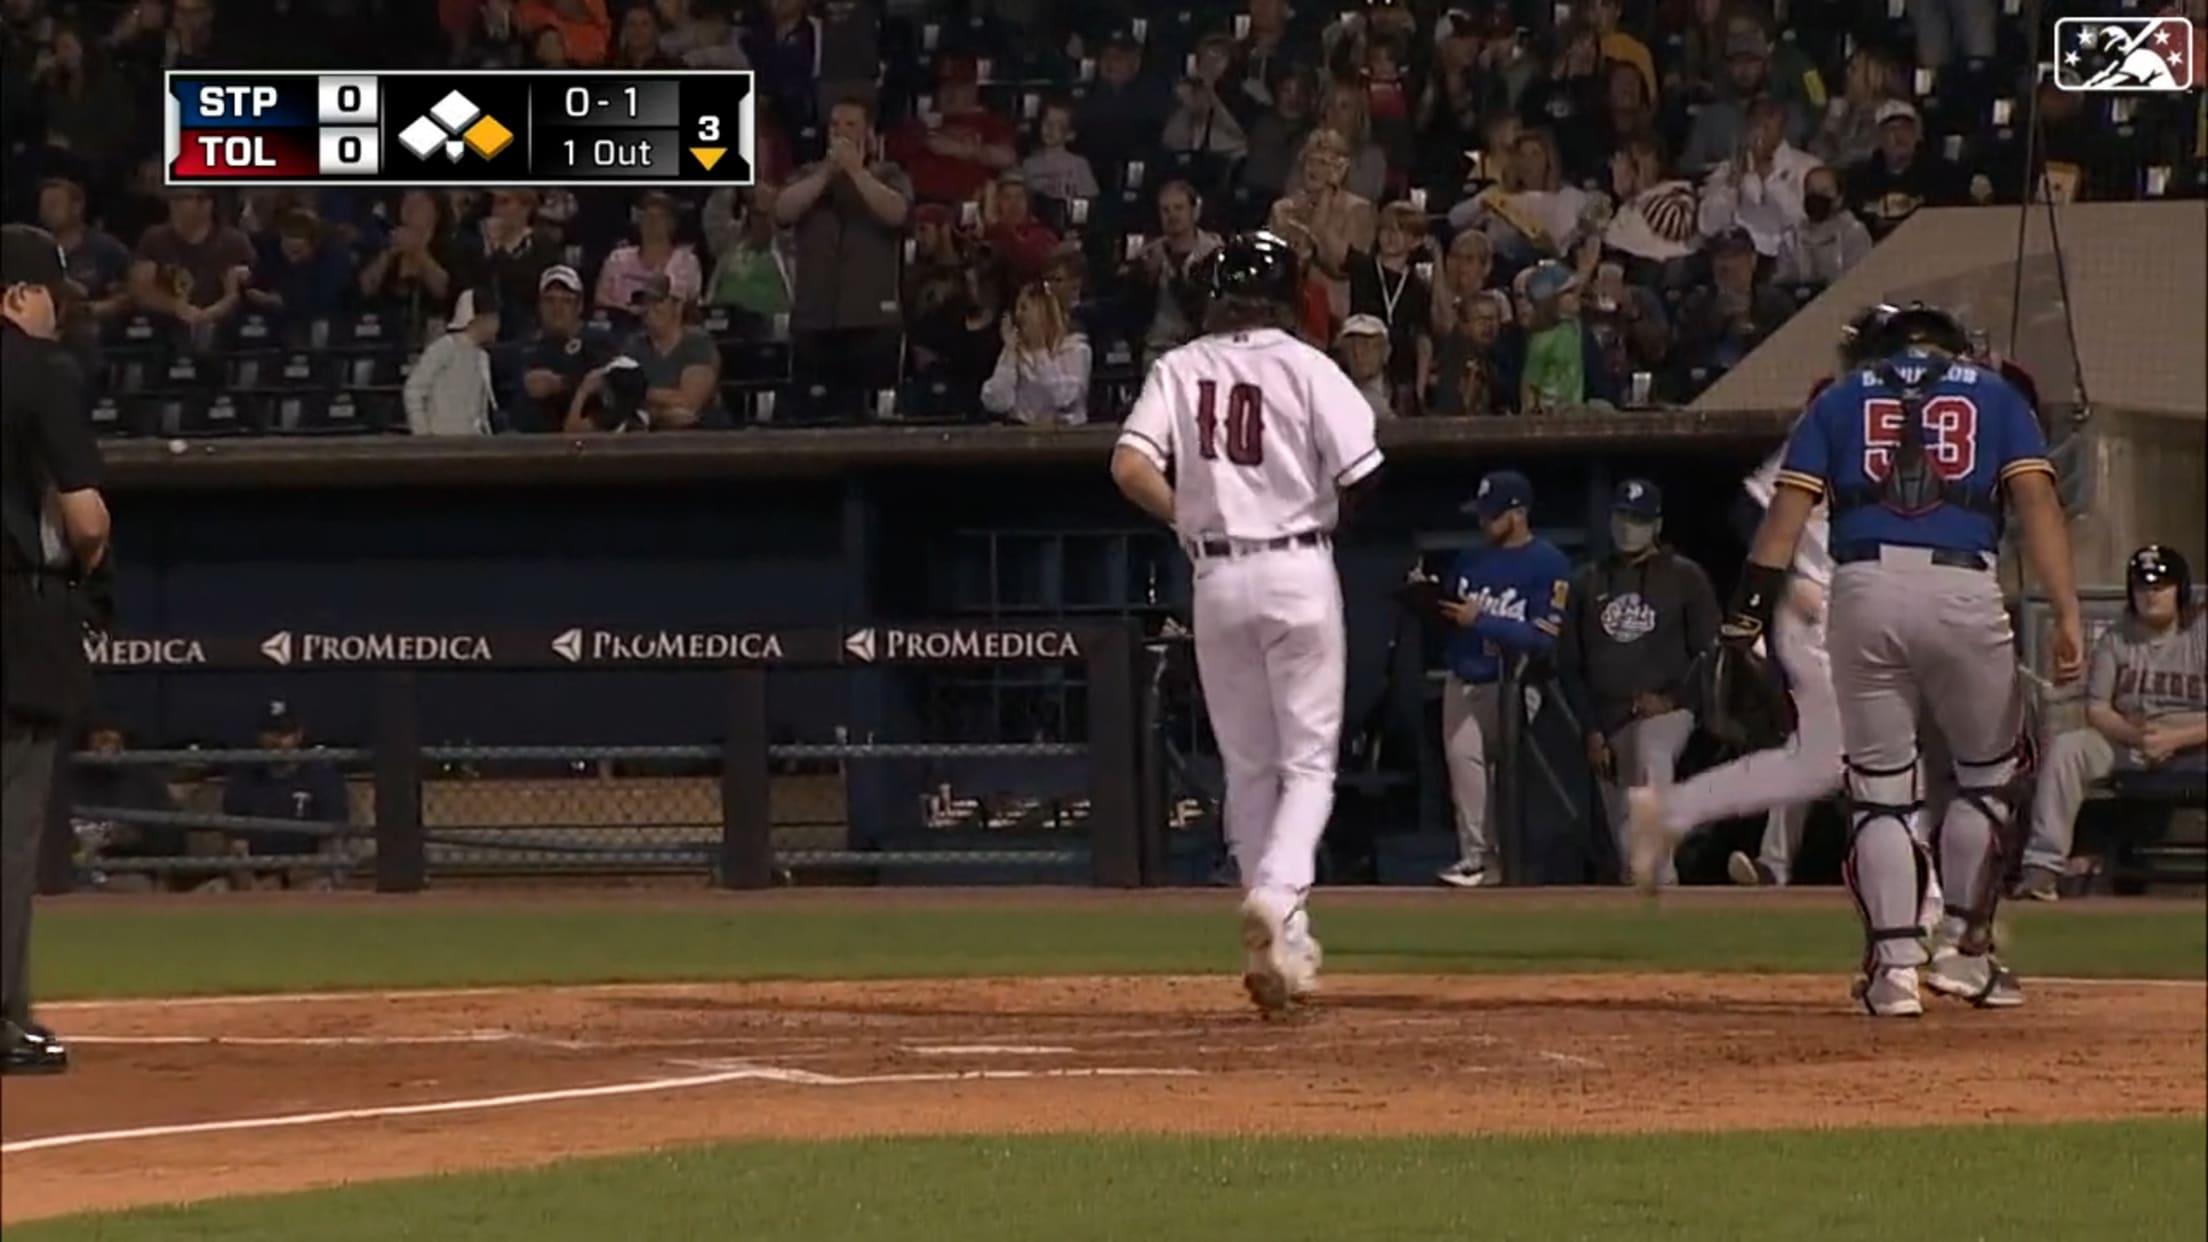 Riley Greene's 24th homer